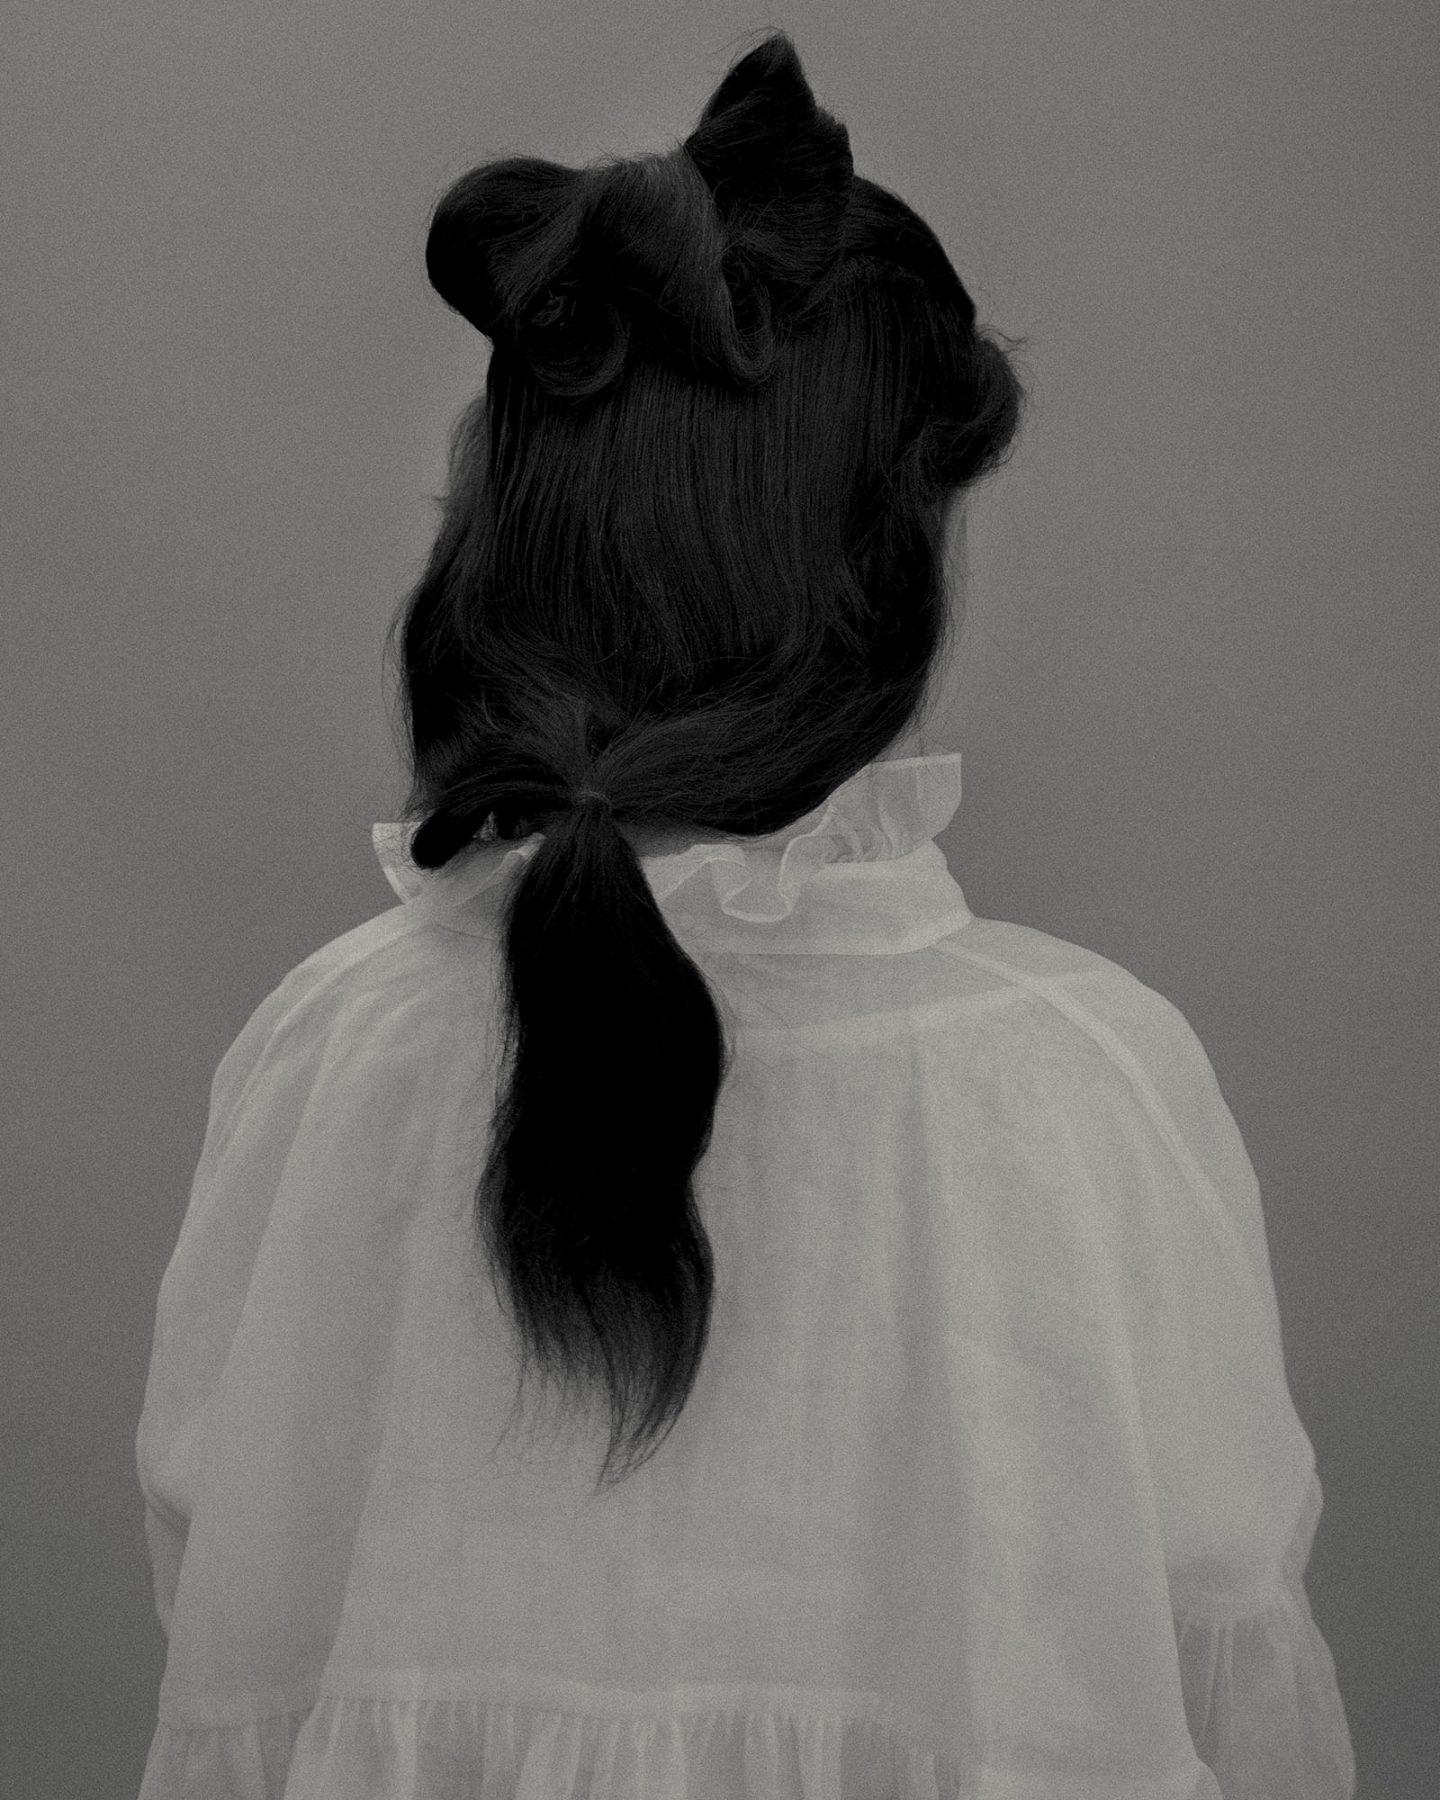 IGNANT-Photography-Paul-Phung-Toufa-Hair-02